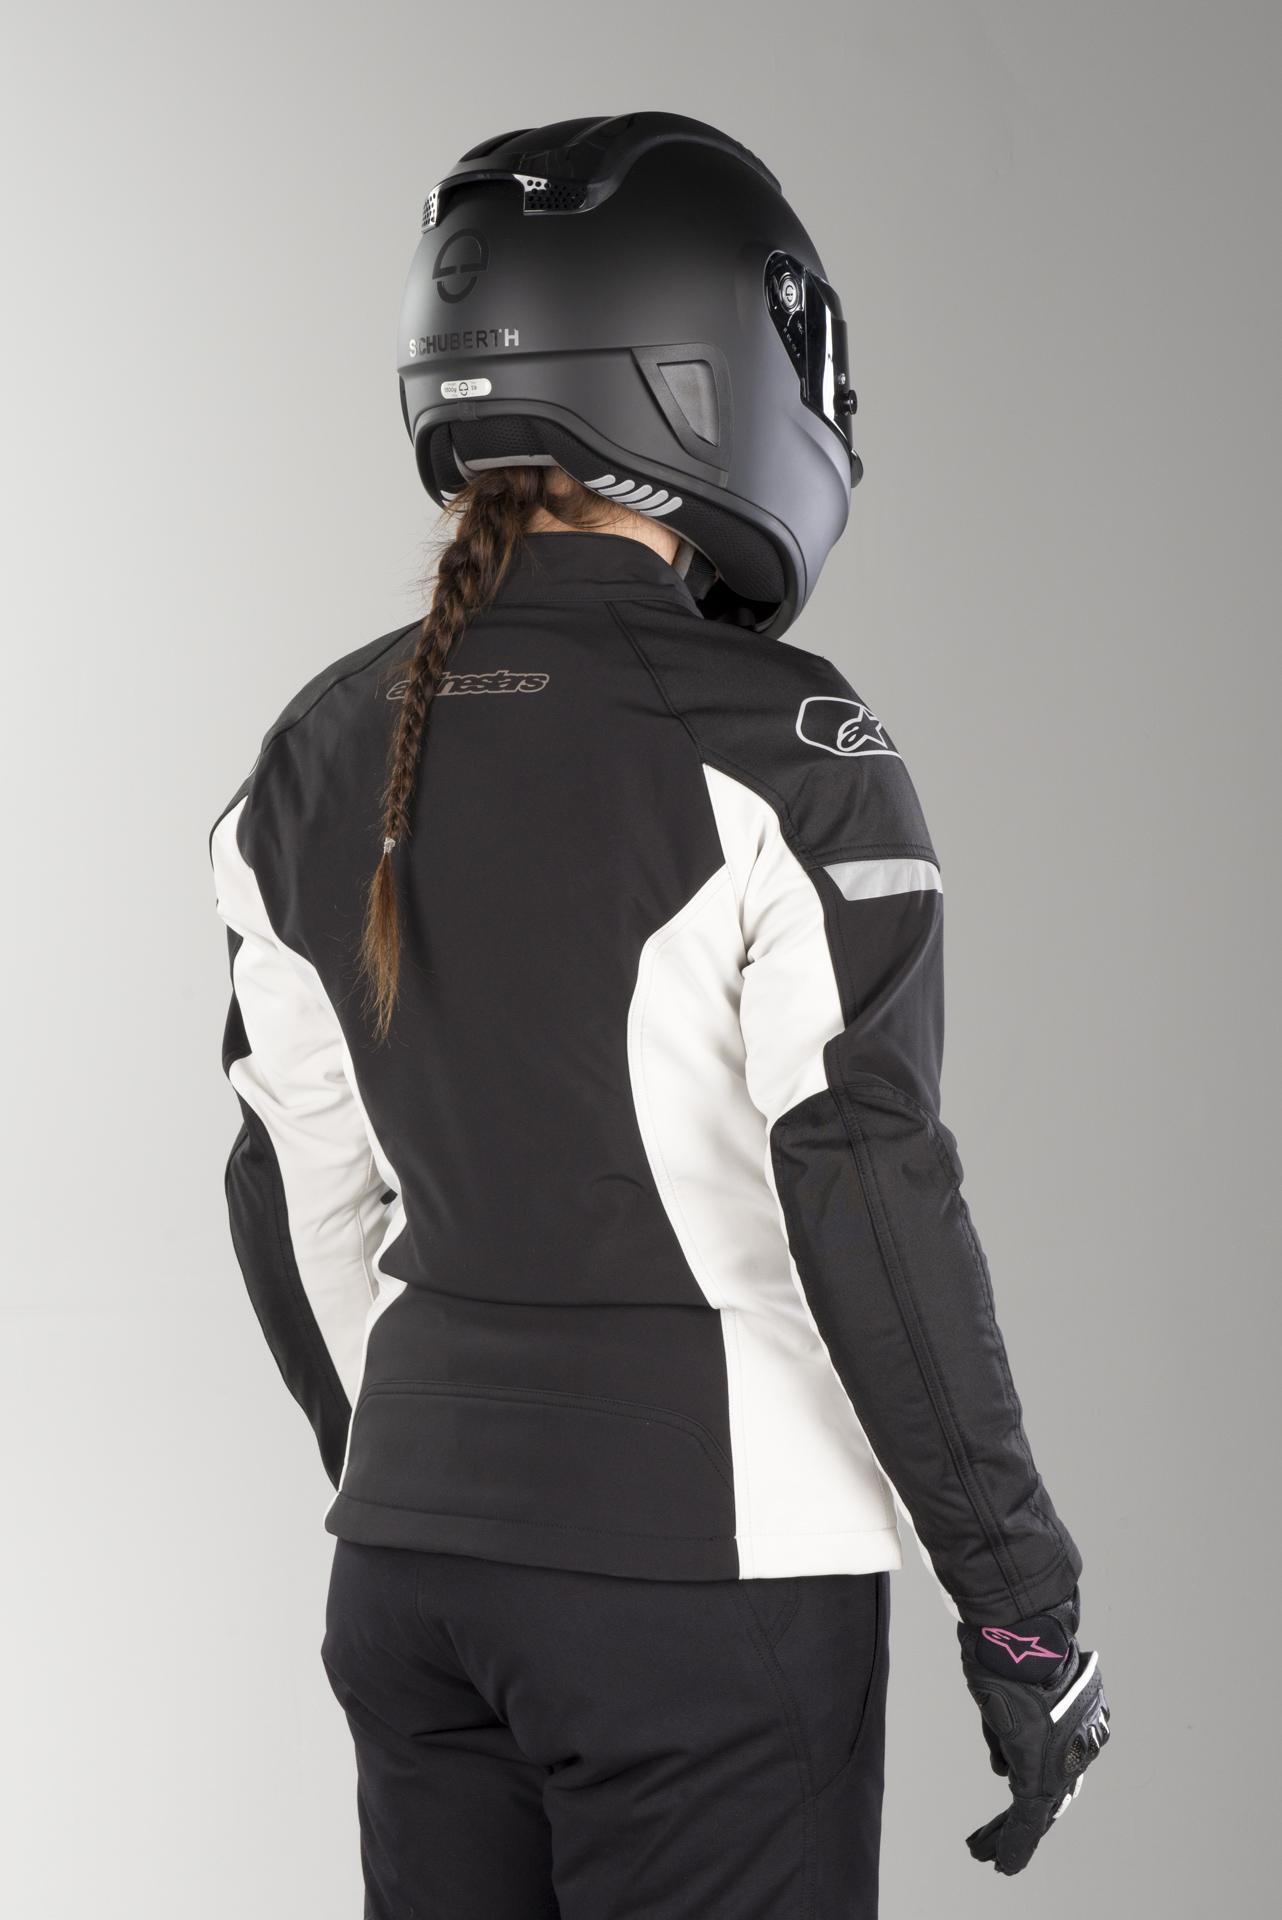 Alpinestars Stratos Techshell Black Drystar Motorcycle Jacket Free Shipping!